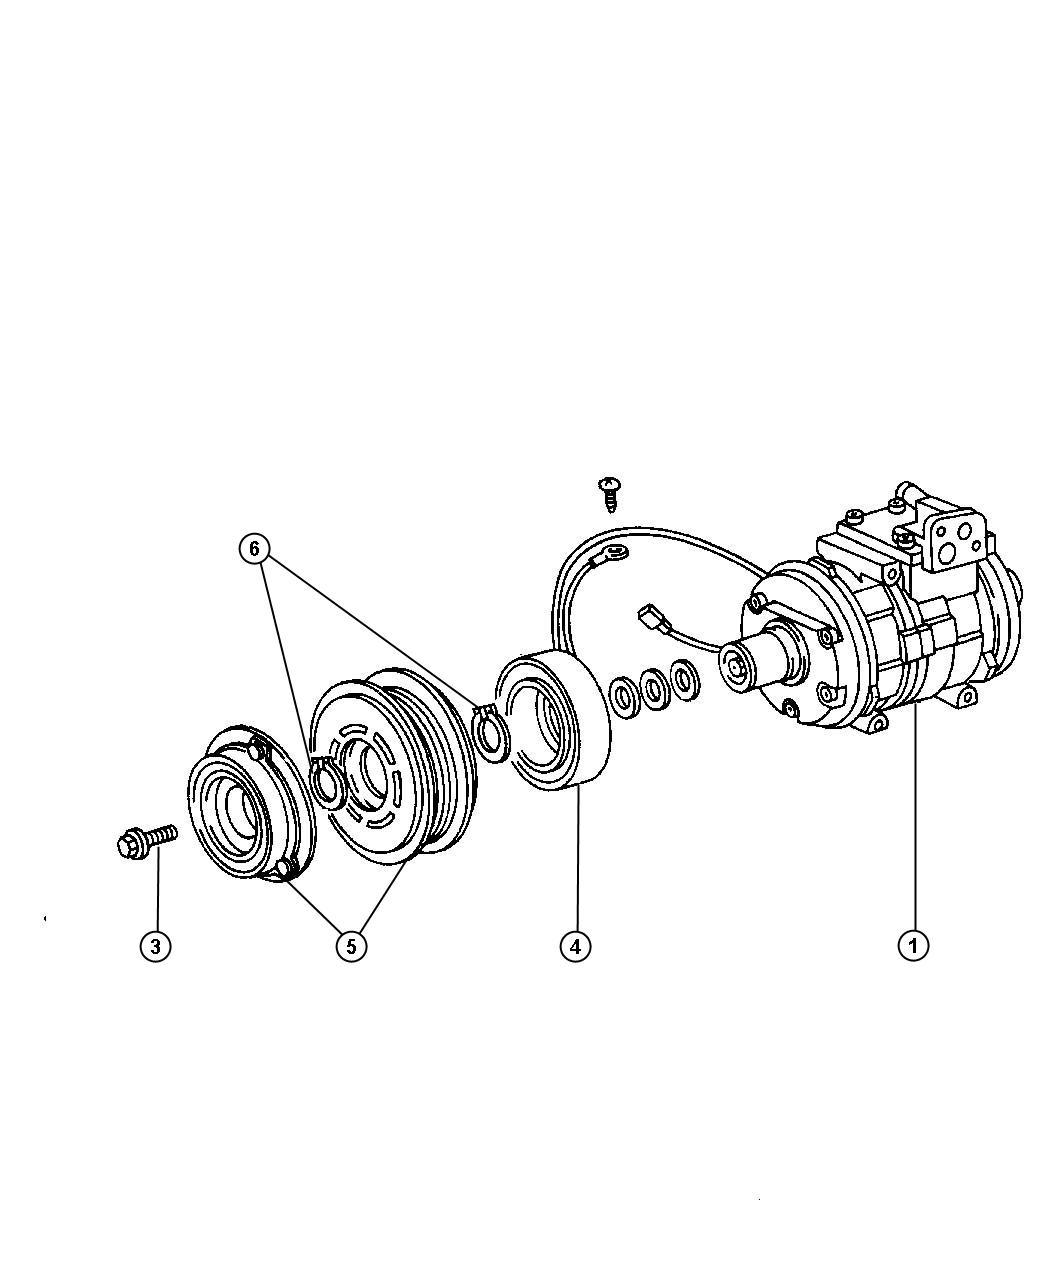 i2195272  Hemi Mds Vvt Engine Diagram on